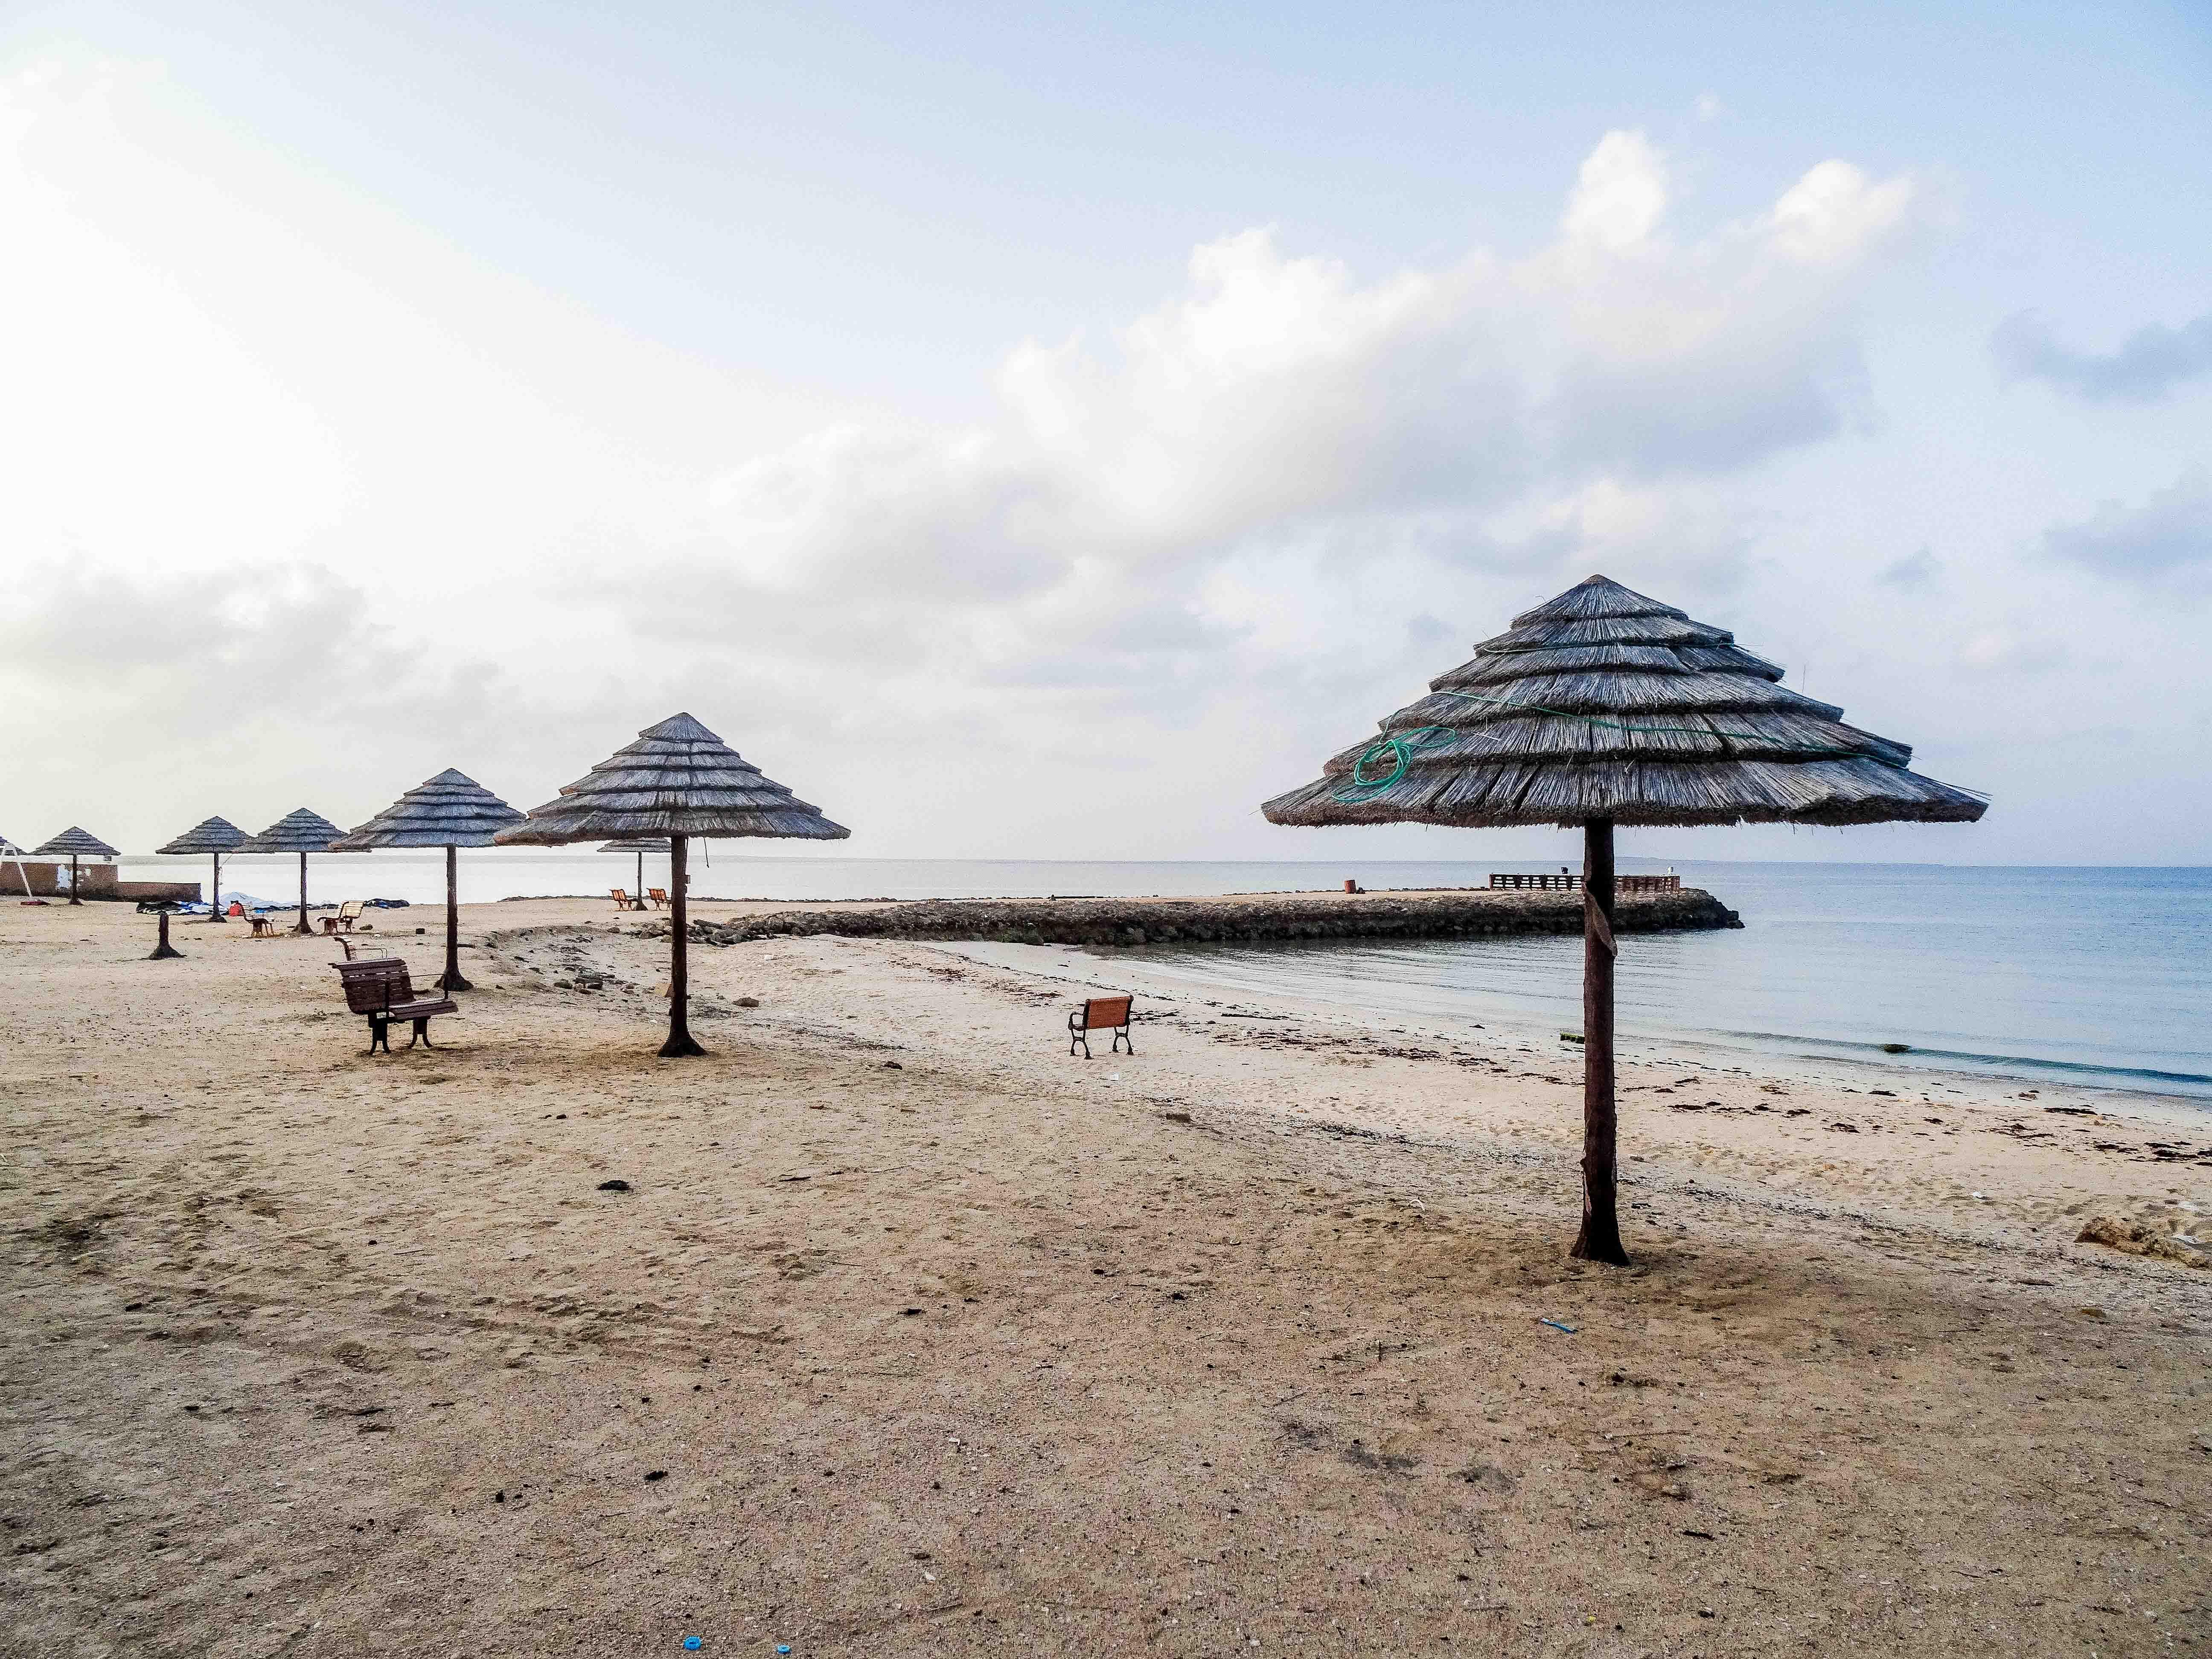 Beach at Coral Hotel in Farasan Al-Kebir (photo: Florent Egal)